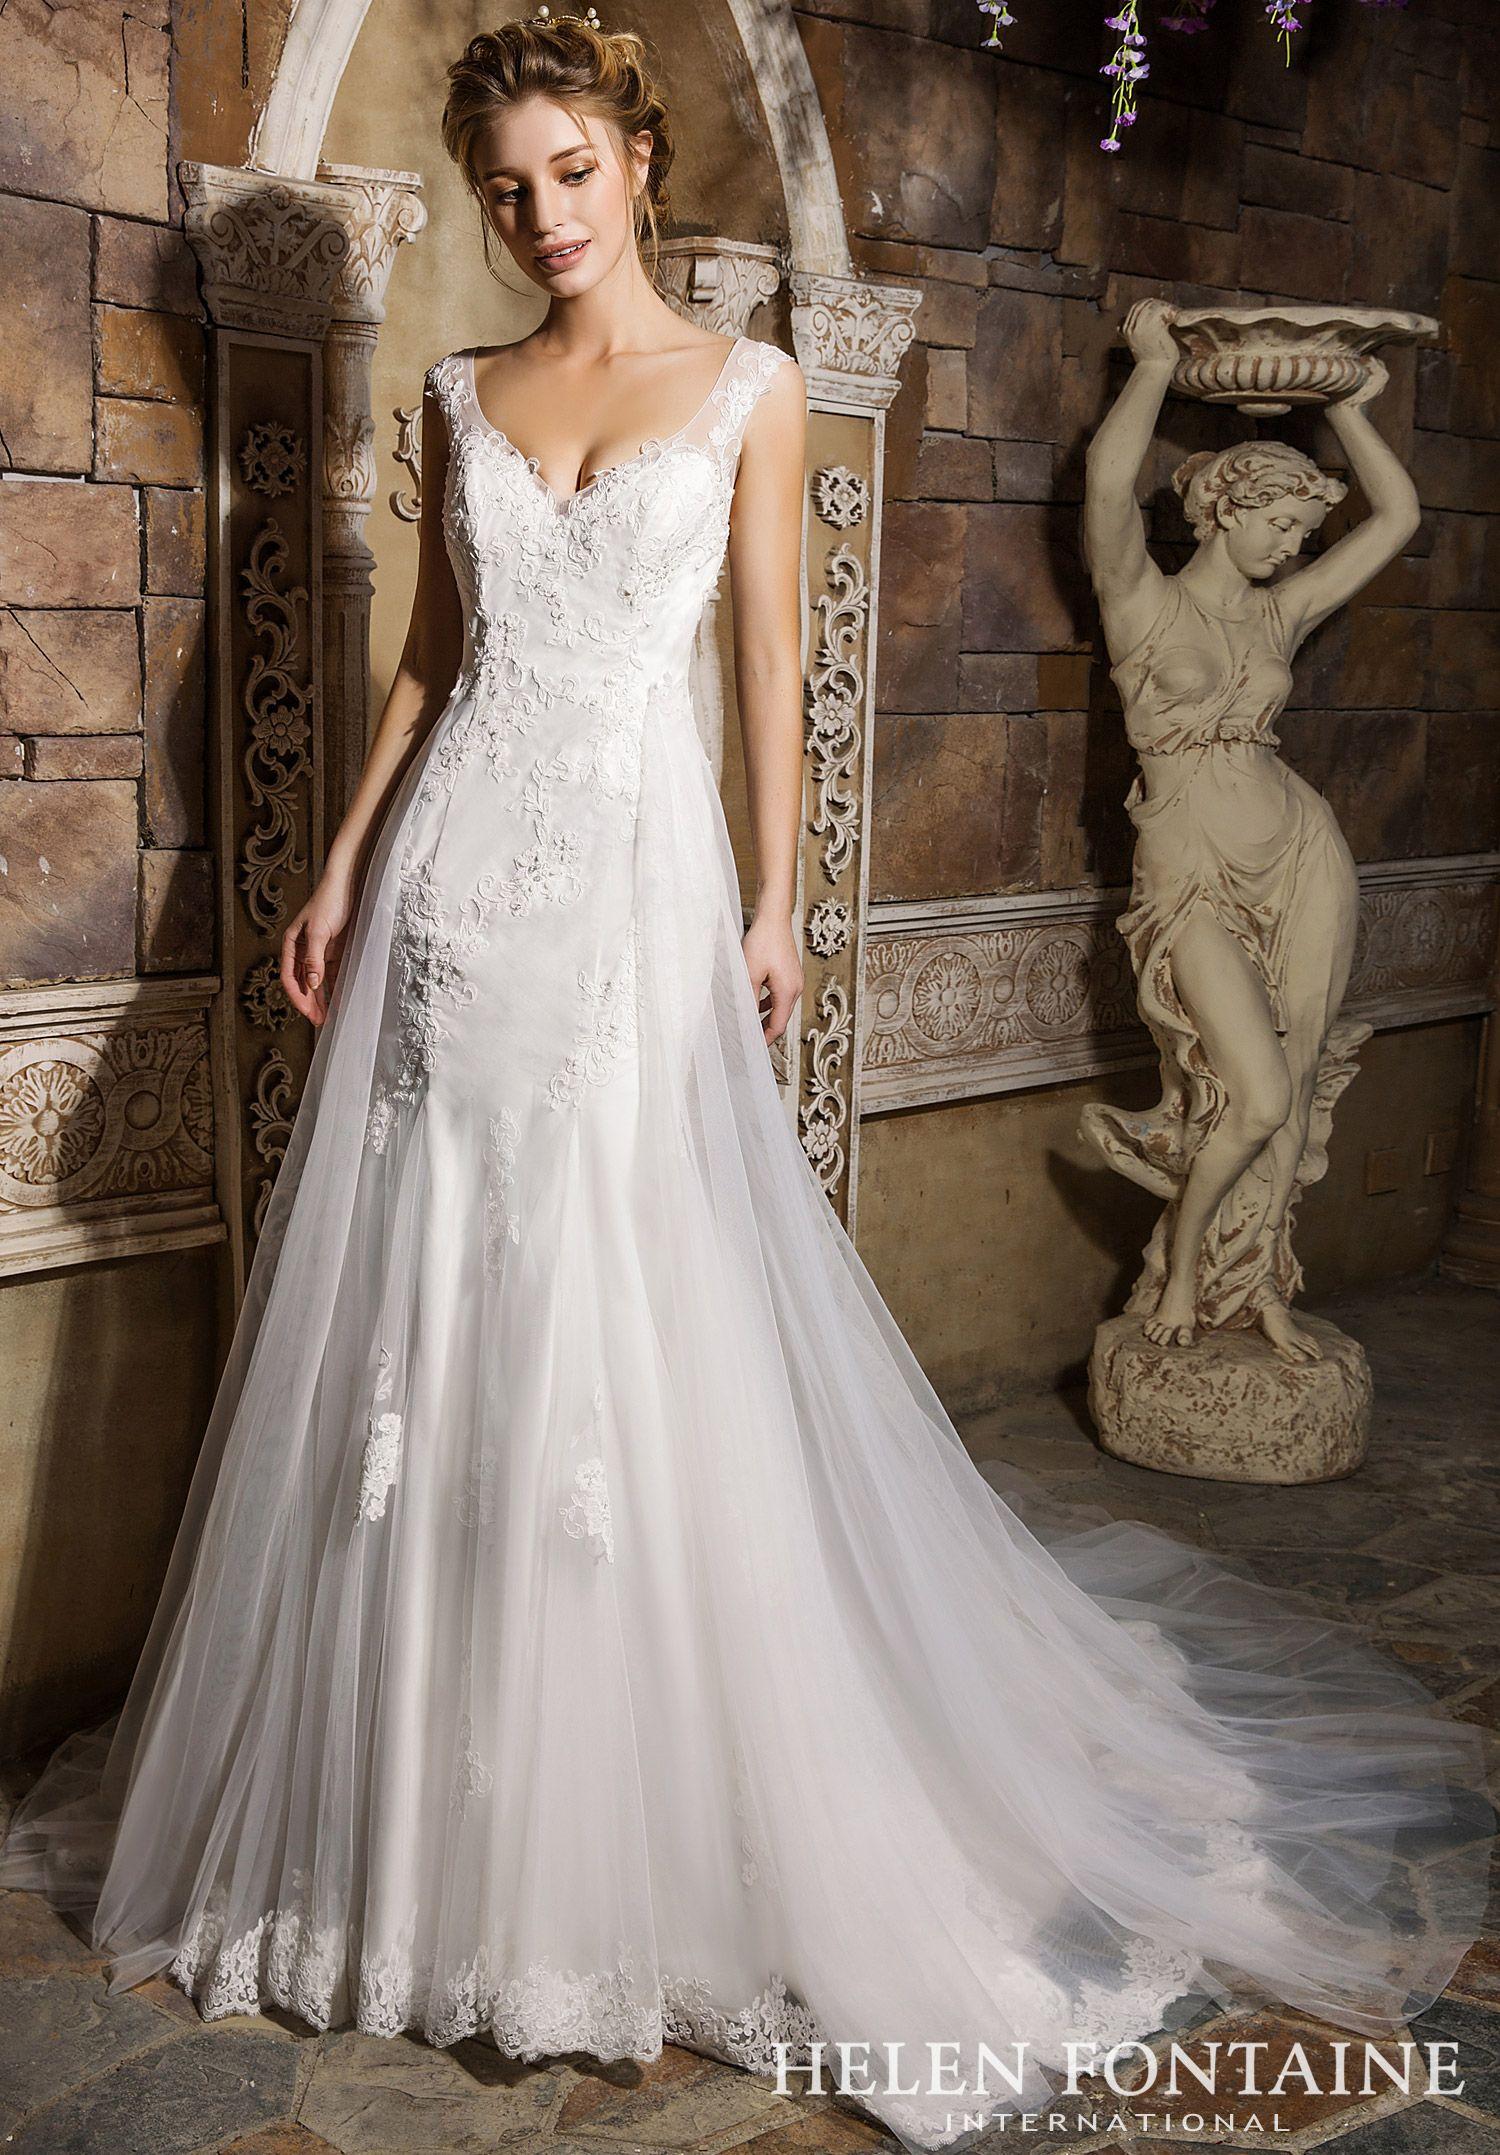 Helen Fontaine Style 2604 Wedding Dresses Under 500 Detachable Train Wedding Dress Wedding Dress Train